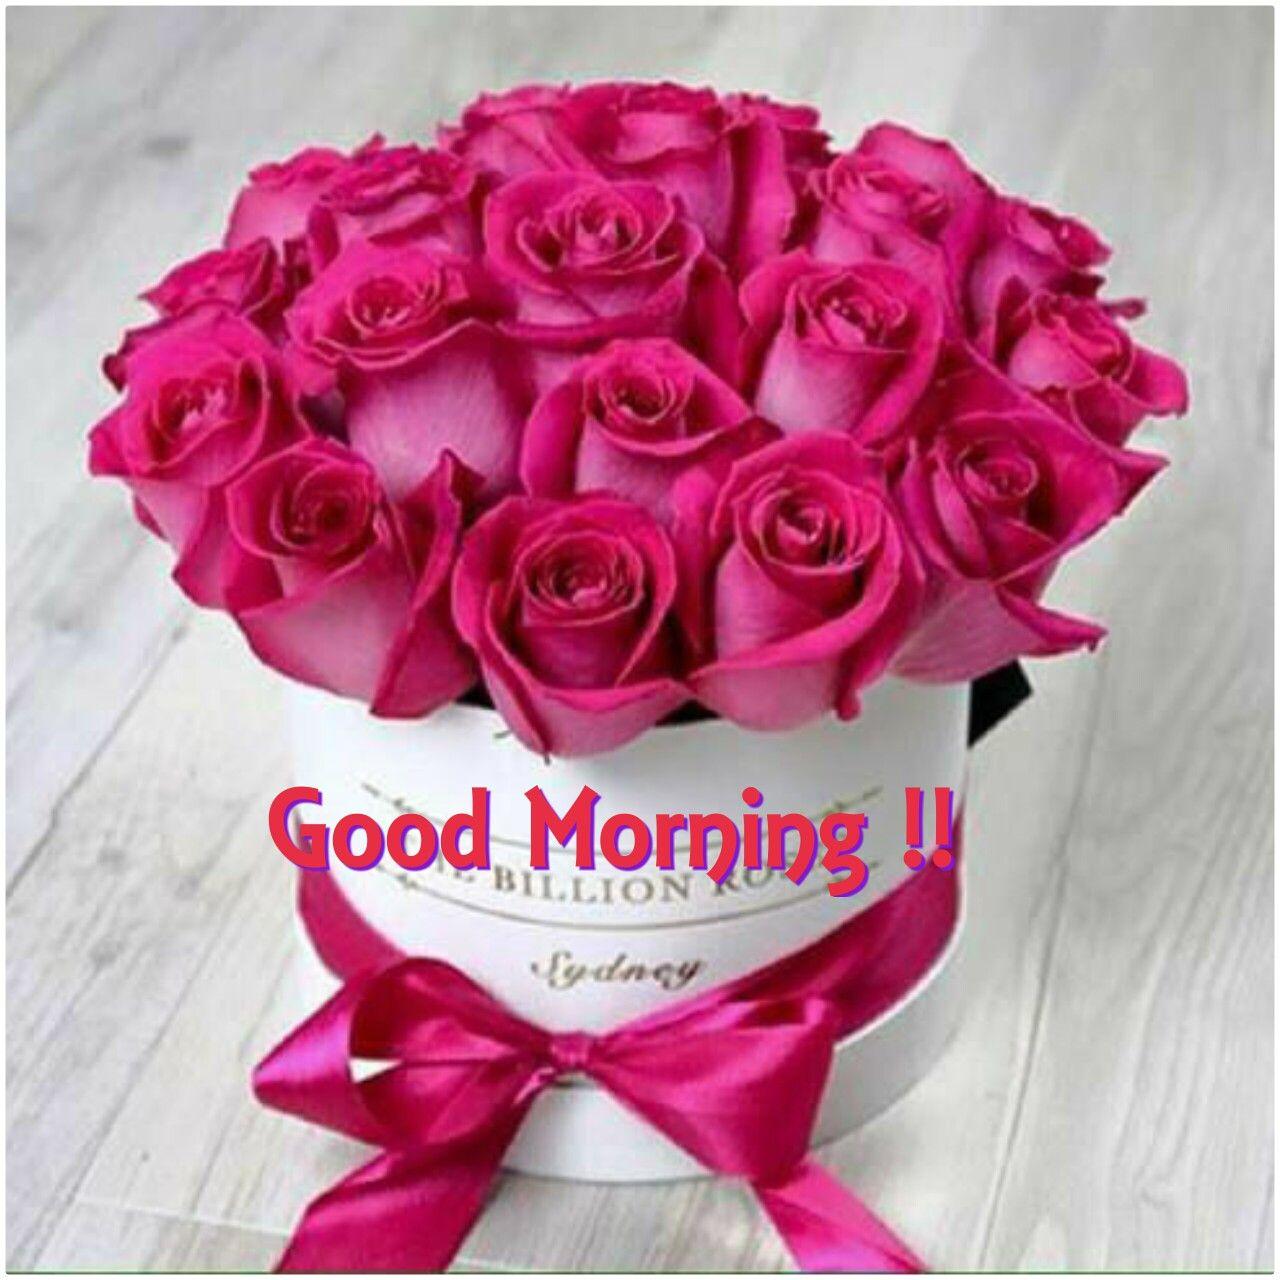 Good morning my beautiful sweetheart I hope you had a good